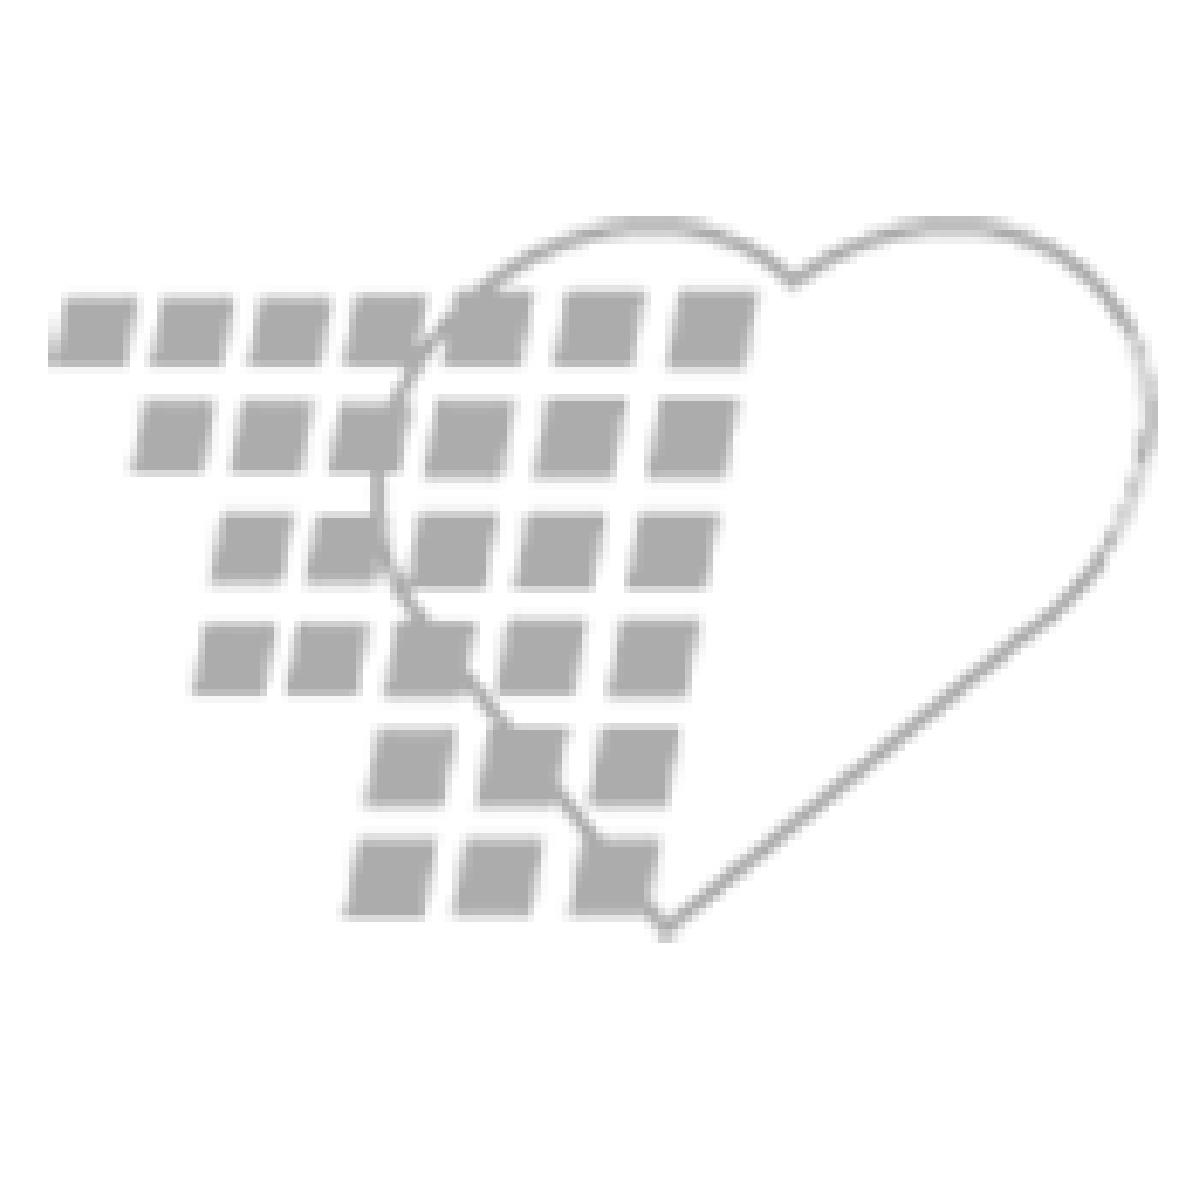 11-81-2135 Simulaids Sani-Man Face Lung System